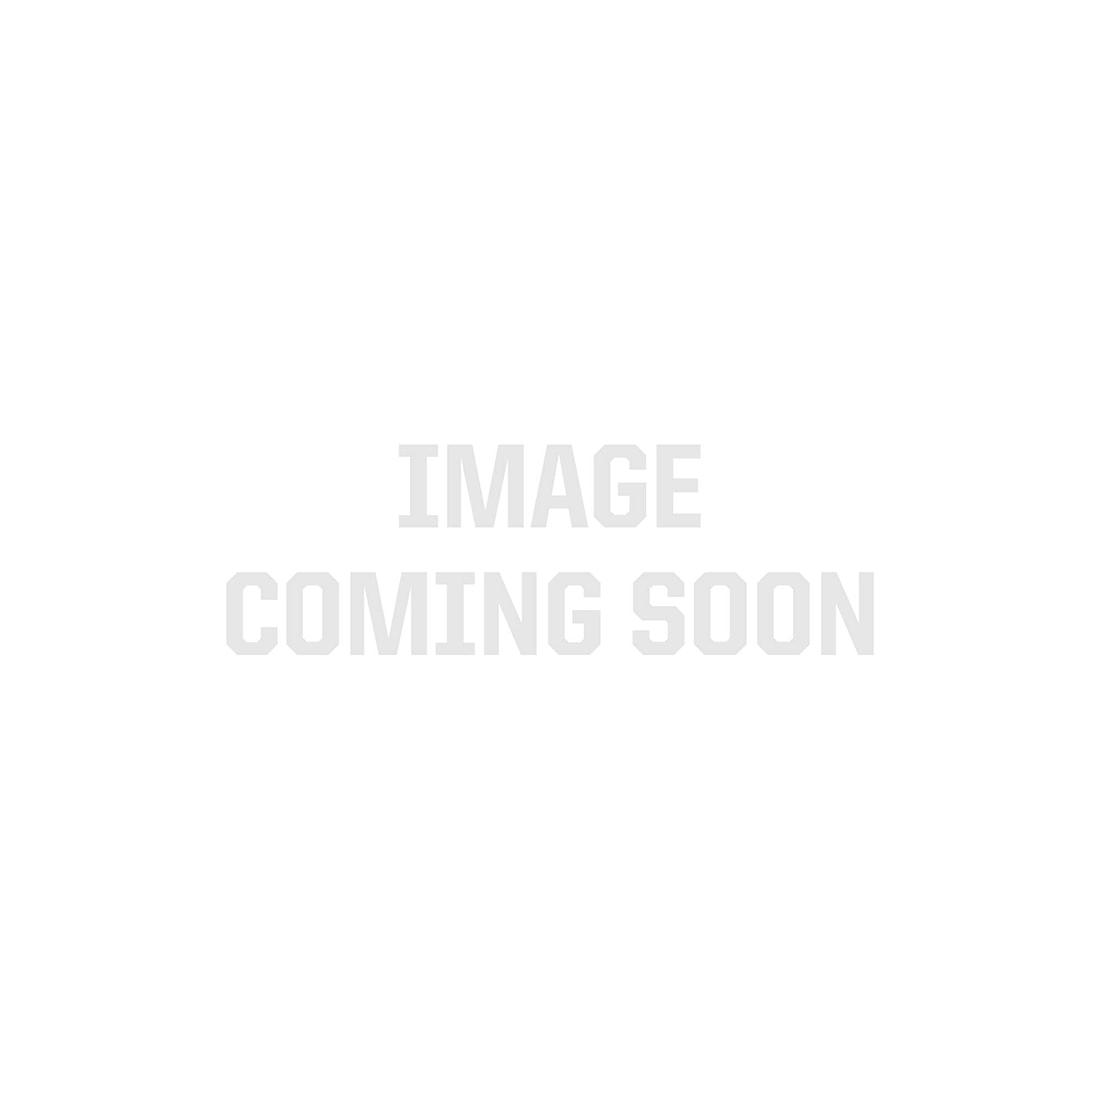 Soft White 3528 Single Row LED Strip Light, 120/m, 10mm wide, Sample Kit